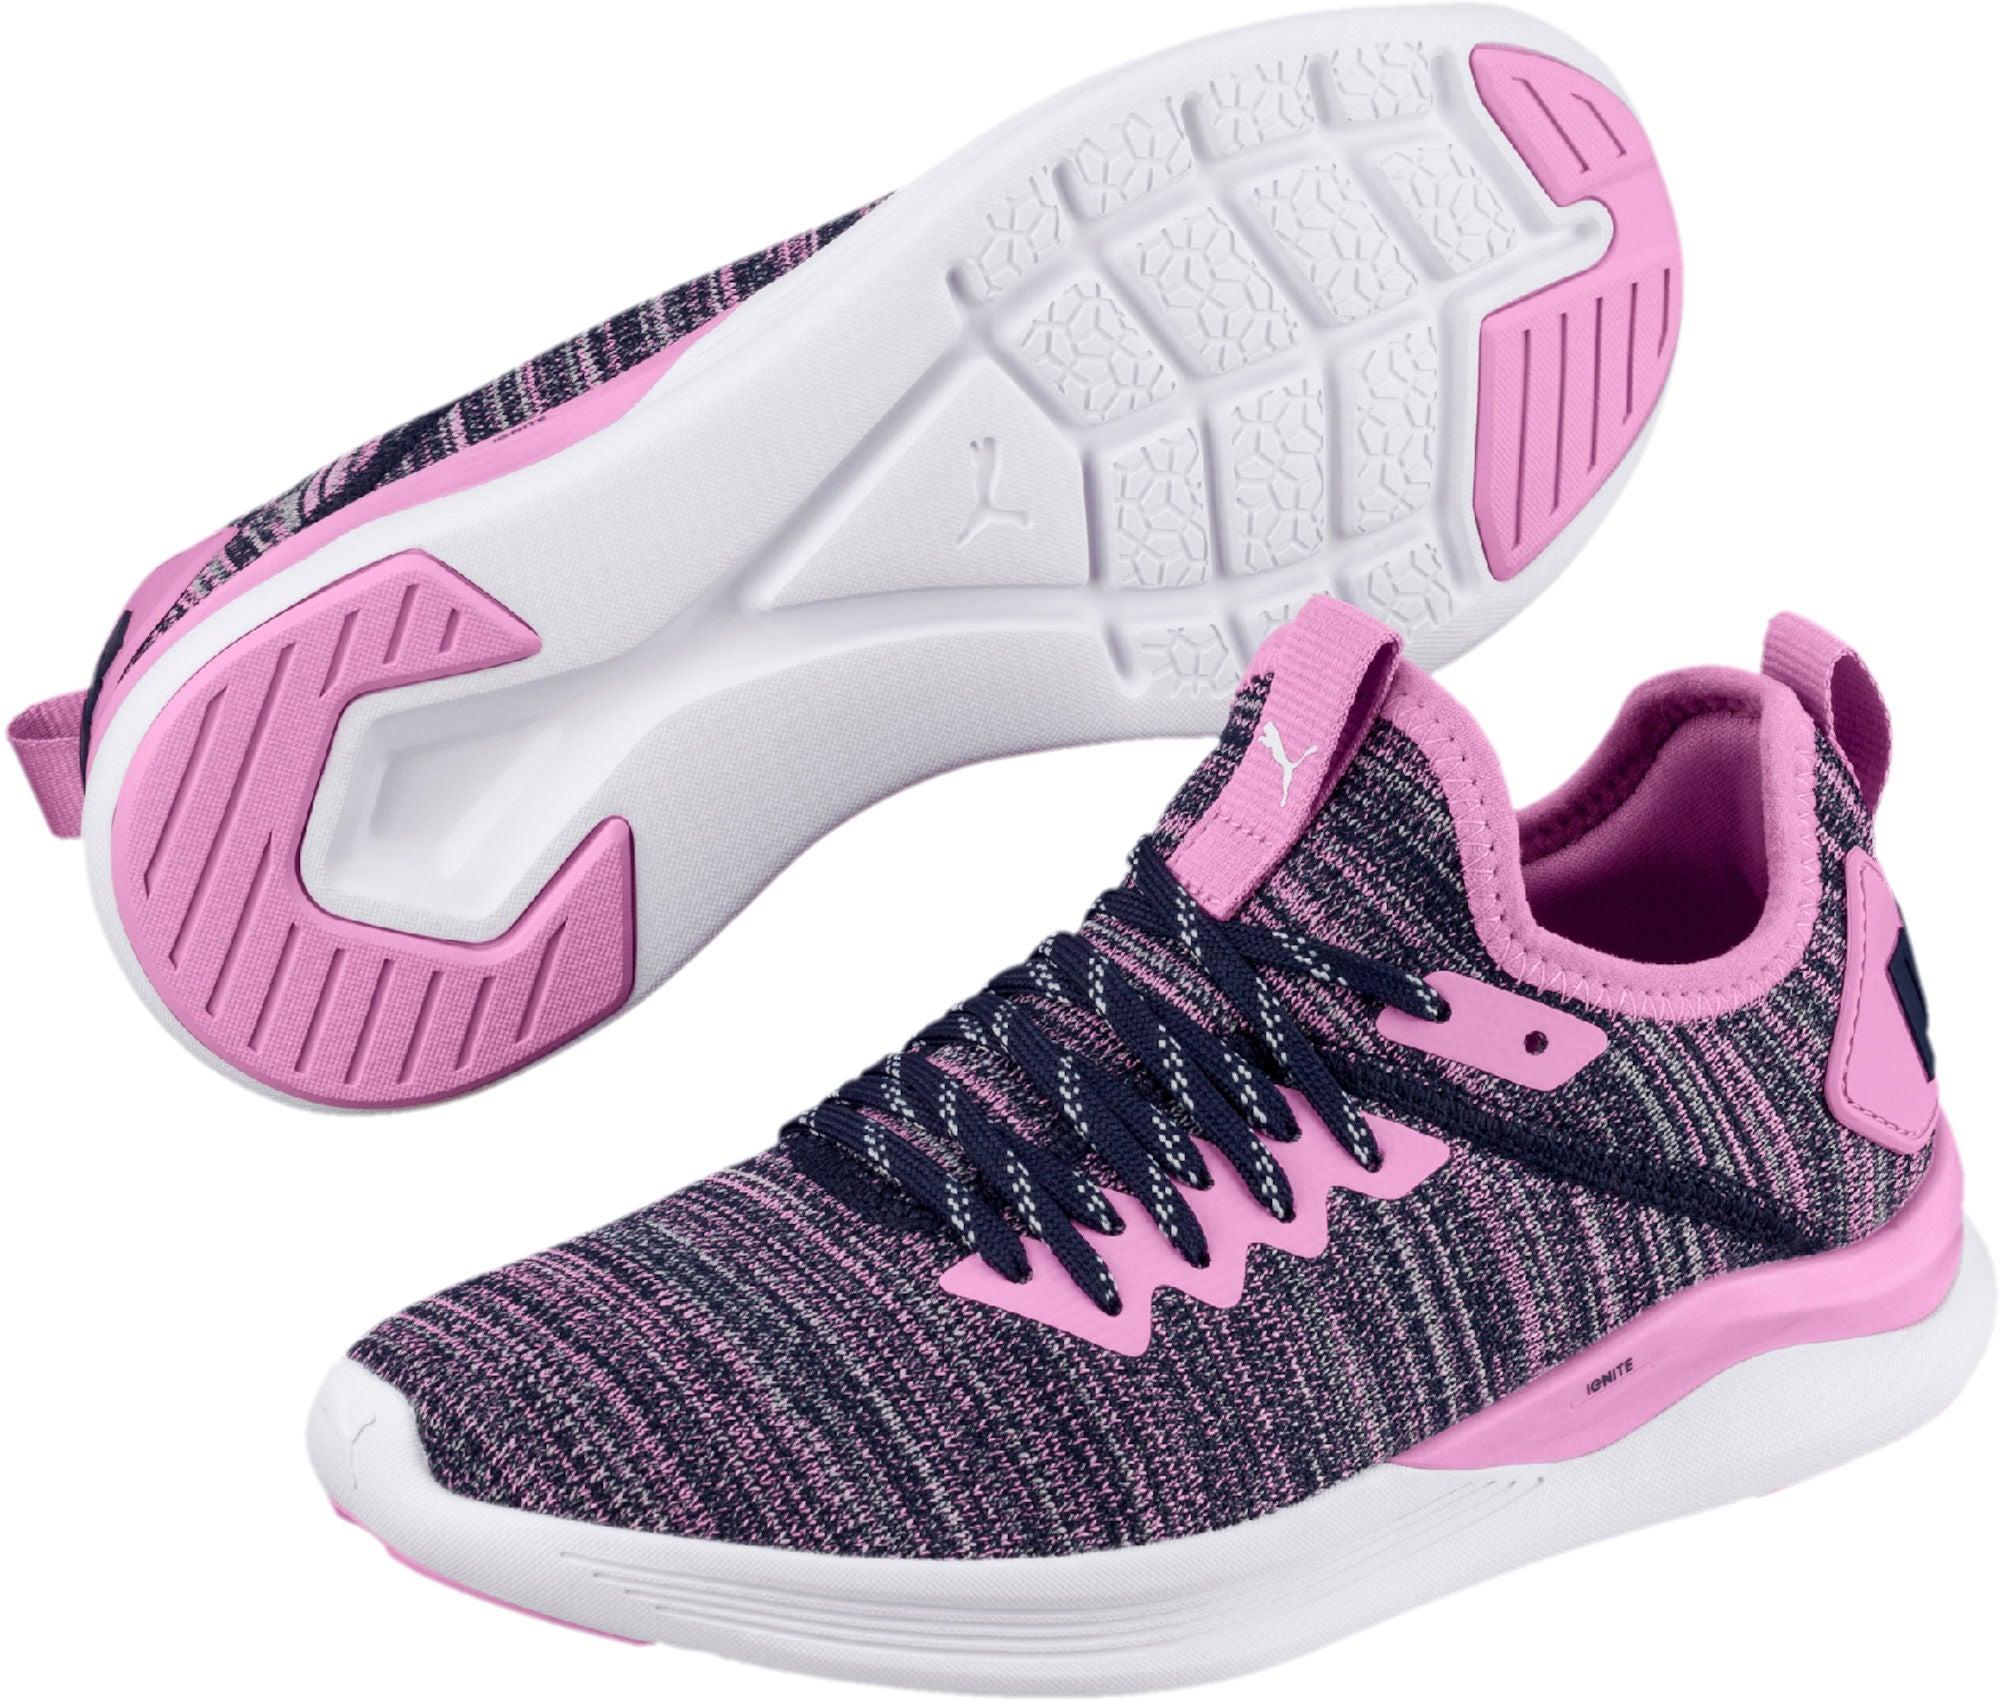 Kjøp Puma Ignite Evoknit Sneaker, Pink   Jollyroom